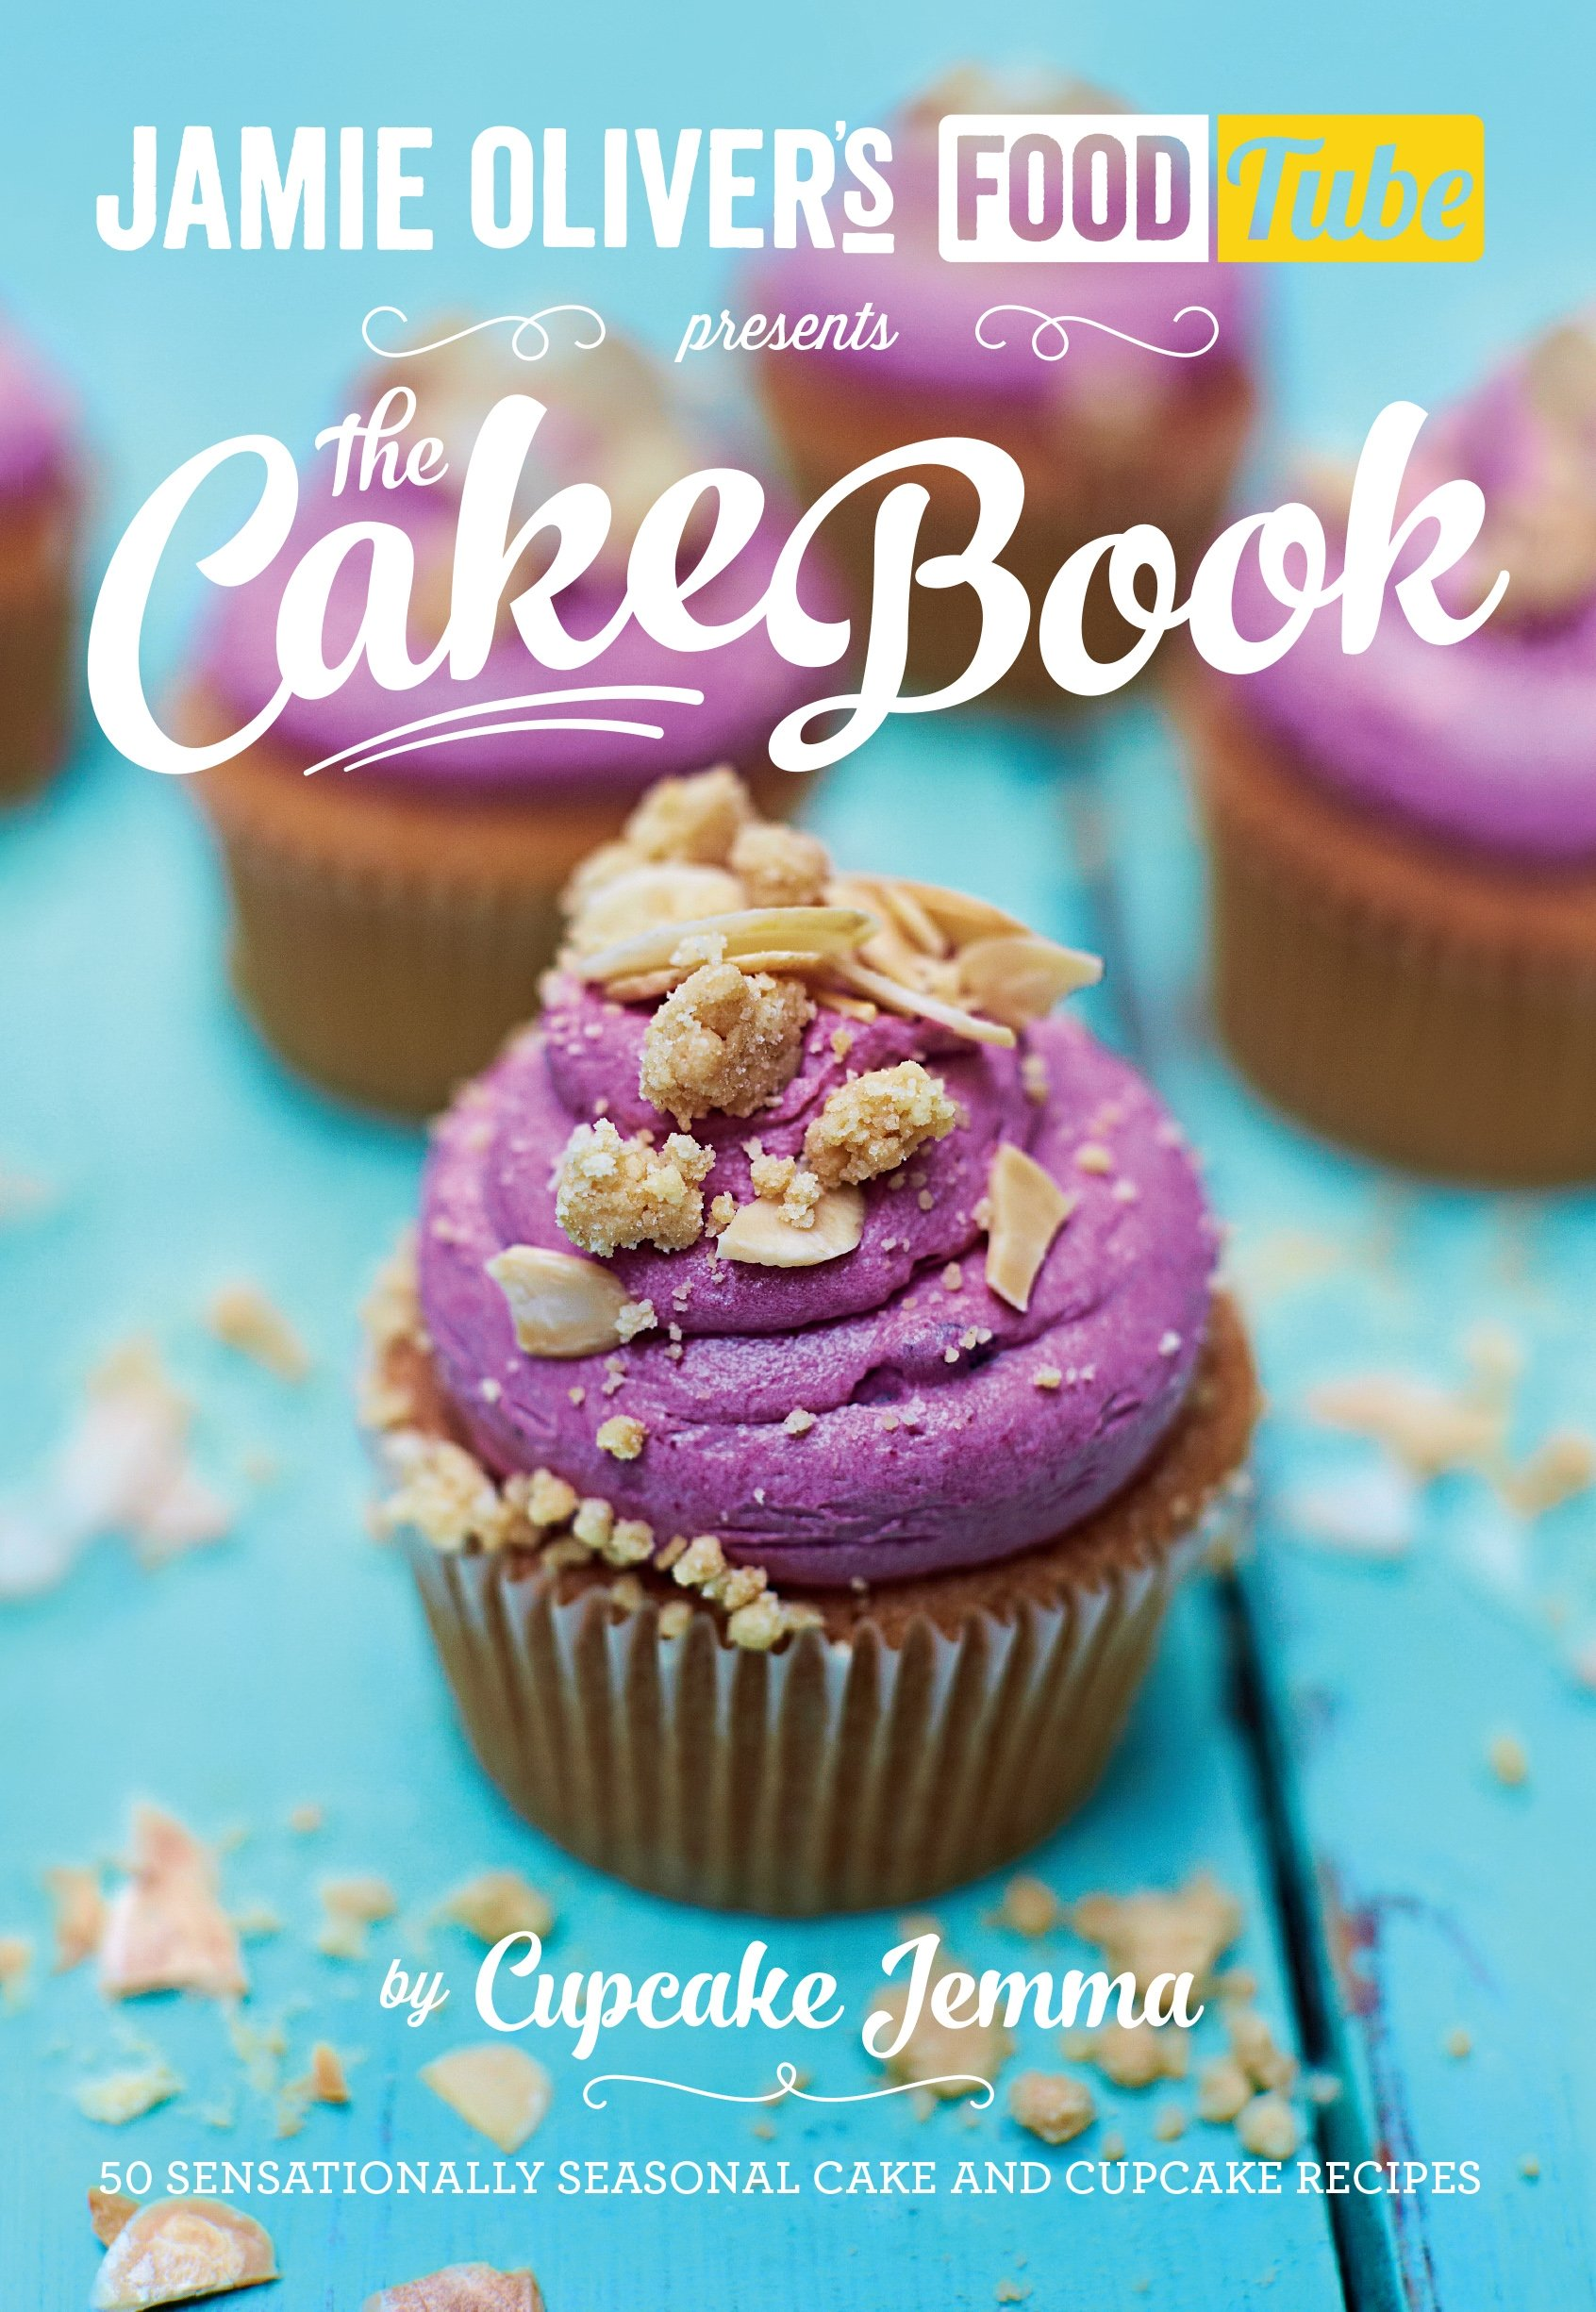 Jamies Food Tube Cake Book product image